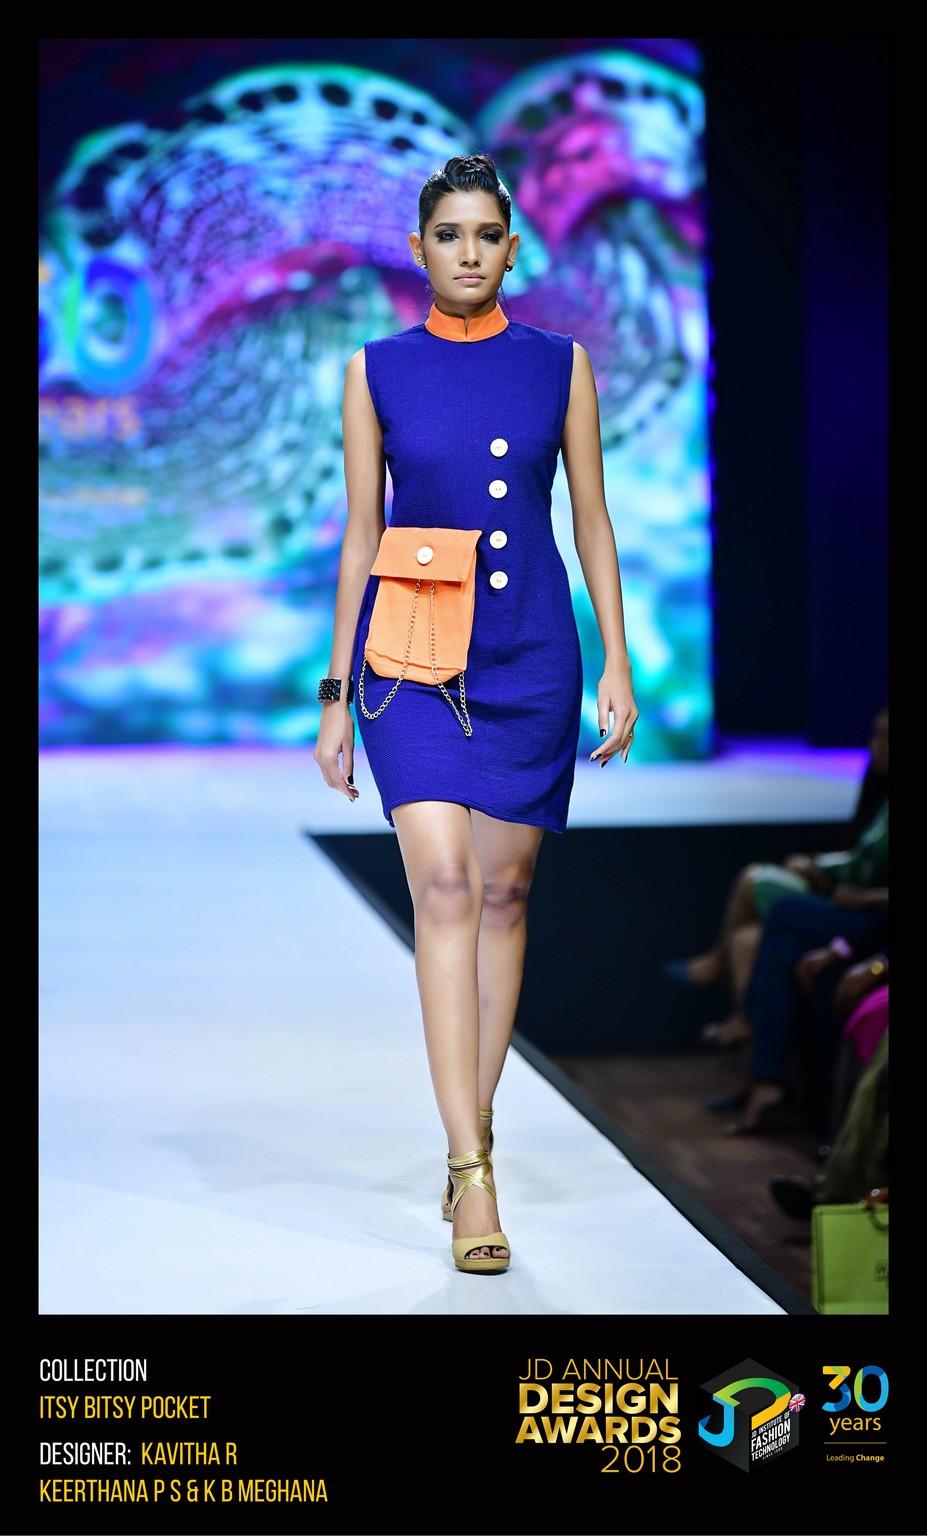 Itsy Bitsy Pocket Dress – Change – JD Annual Design Awards 2018   Designer: Kavitha, Keertana and Meghana   Photography : Jerin Nath (@jerin_nath) itsy bitsy pocket dress Itsy Bitsy Pocket Dress – Change – JD Annual Design Awards 2018 ITSY BITSY POCKET6